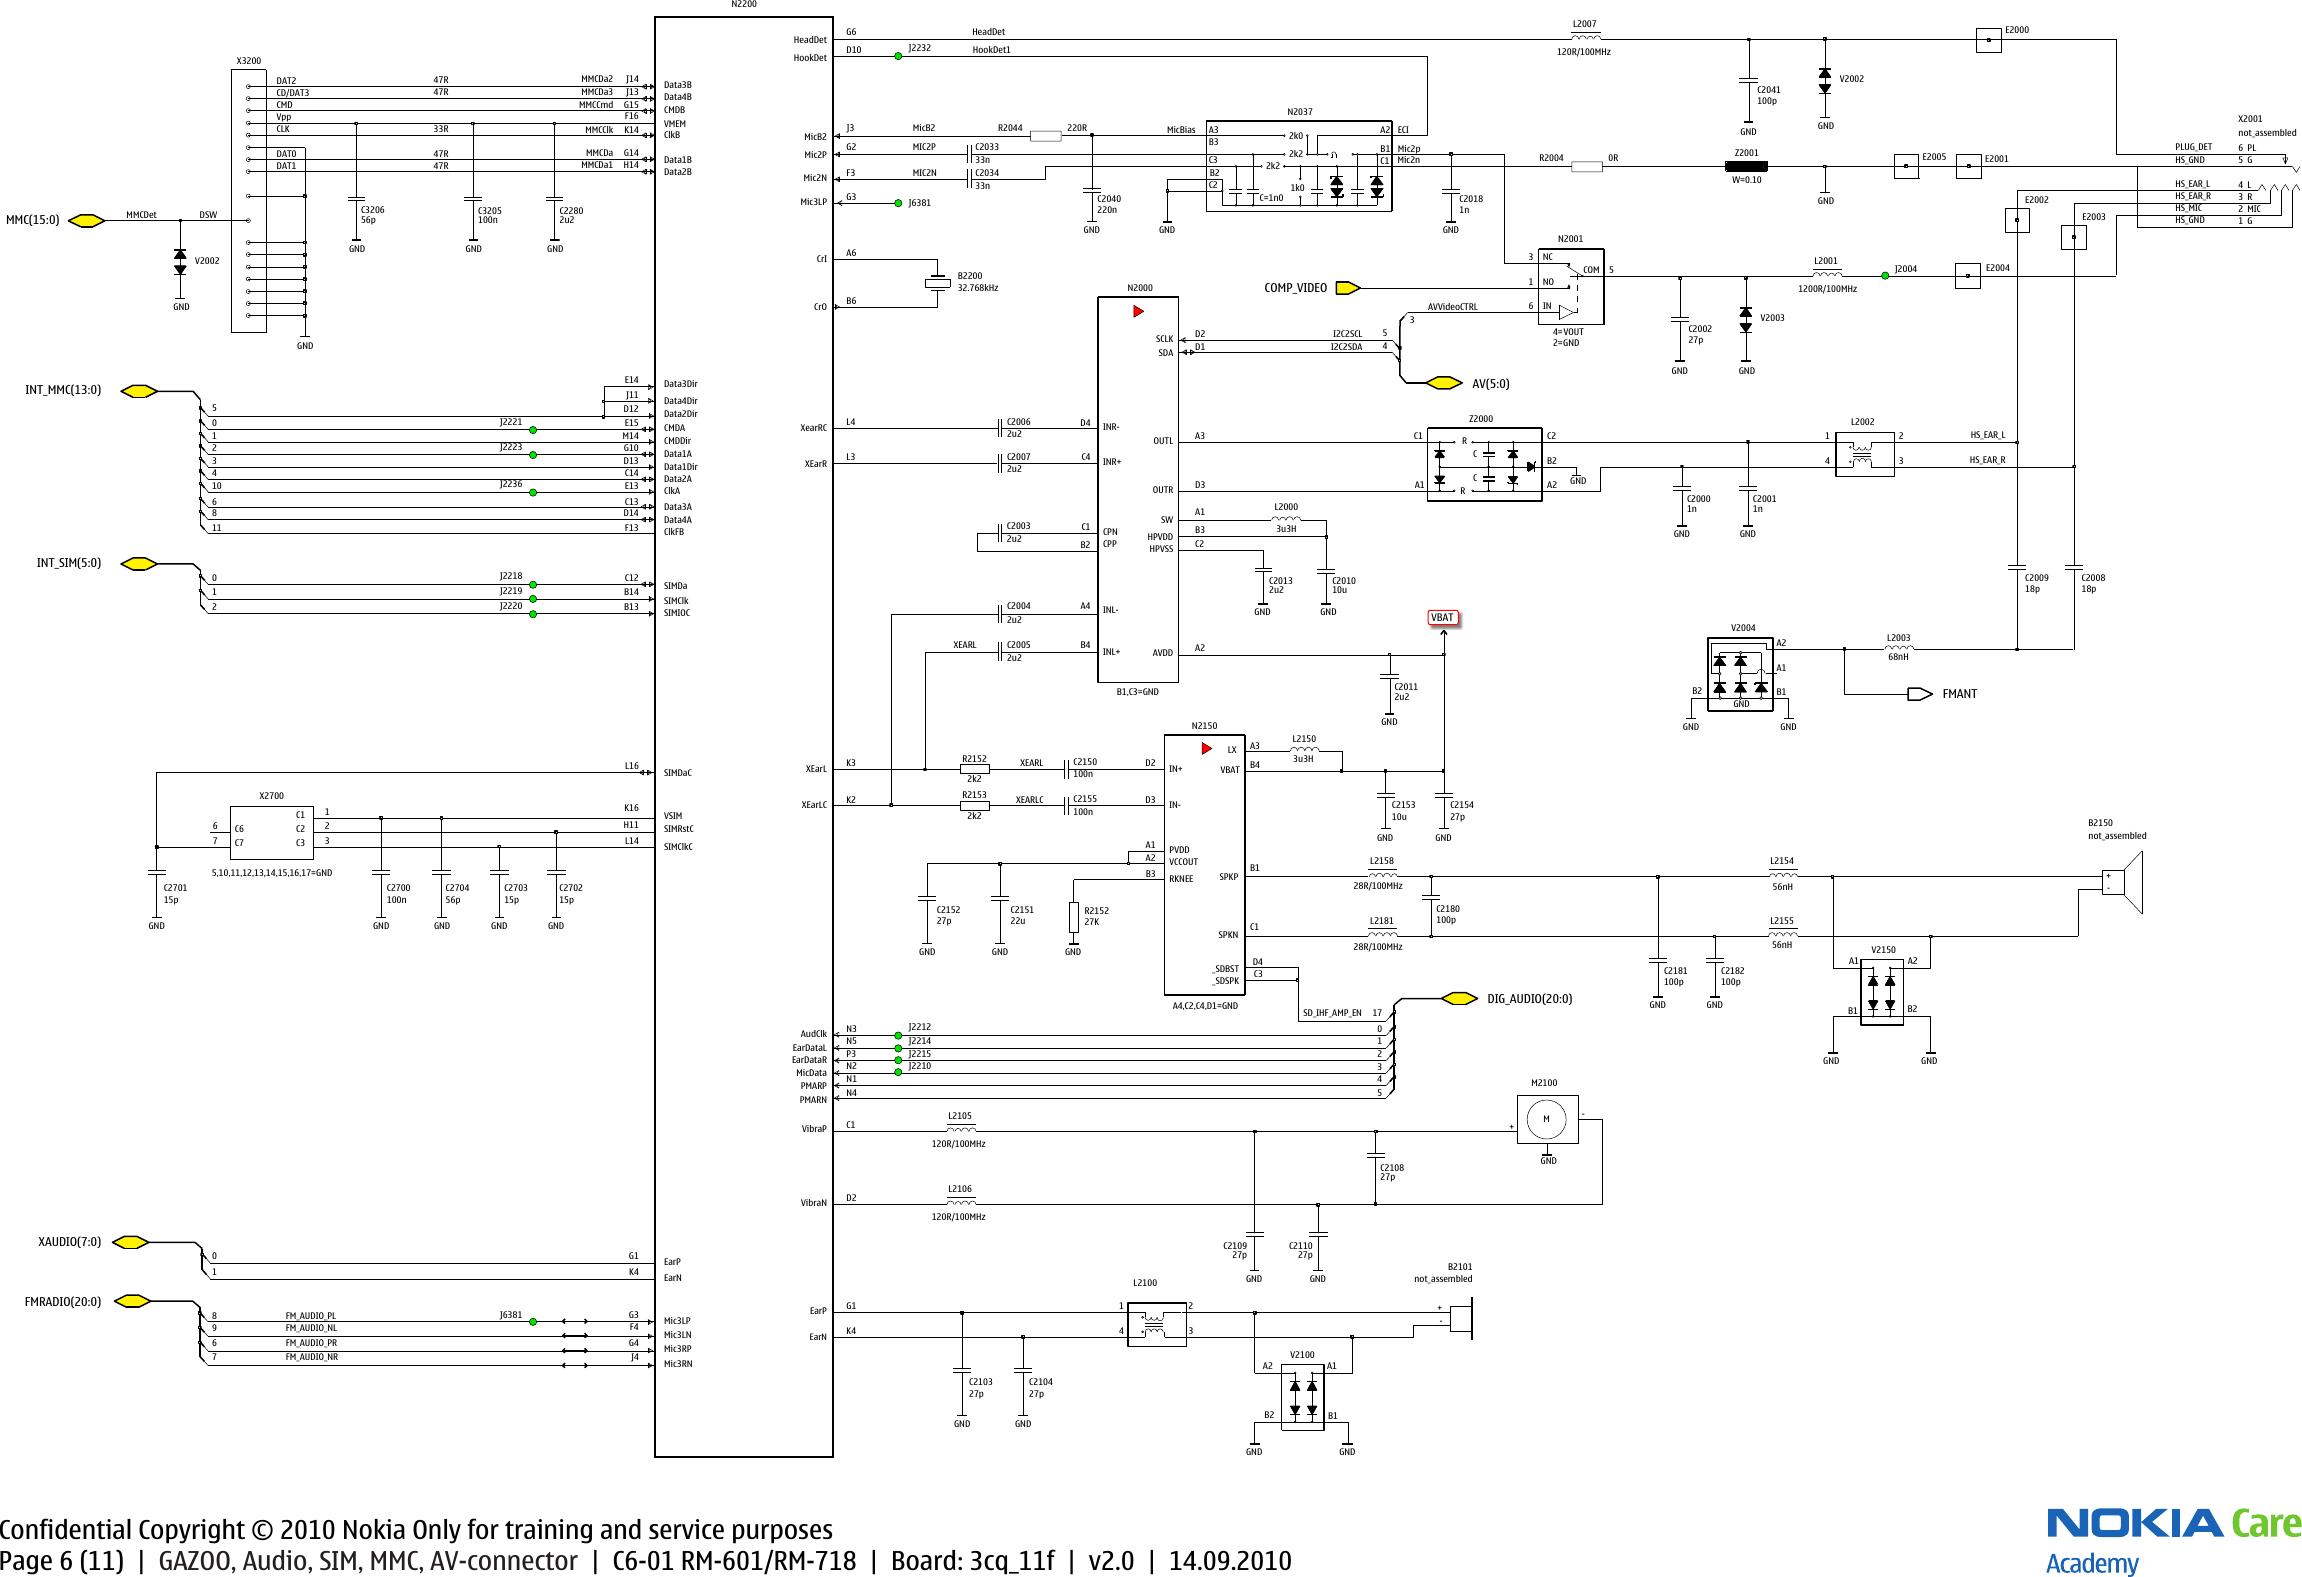 Nokia C6 Service Manual Volvo Wiring Diagram Fl6 Pdf Array 01 Rm 601 718 Schematics V2 Rh Usermanual Wiki